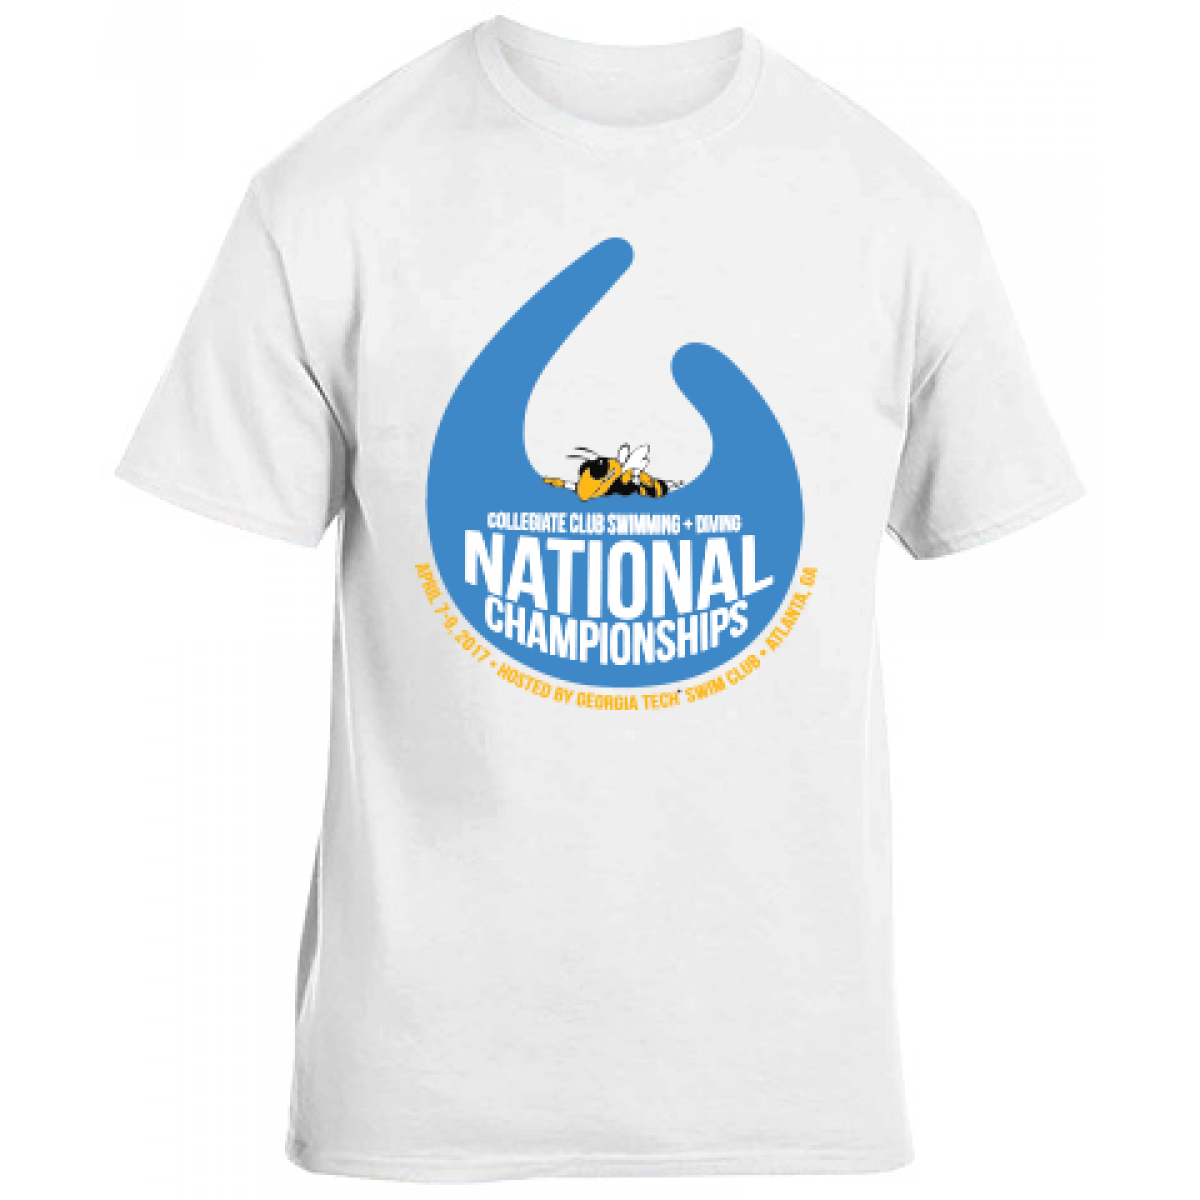 Collegiate Club Cotton Short Sleeve T-Shirt